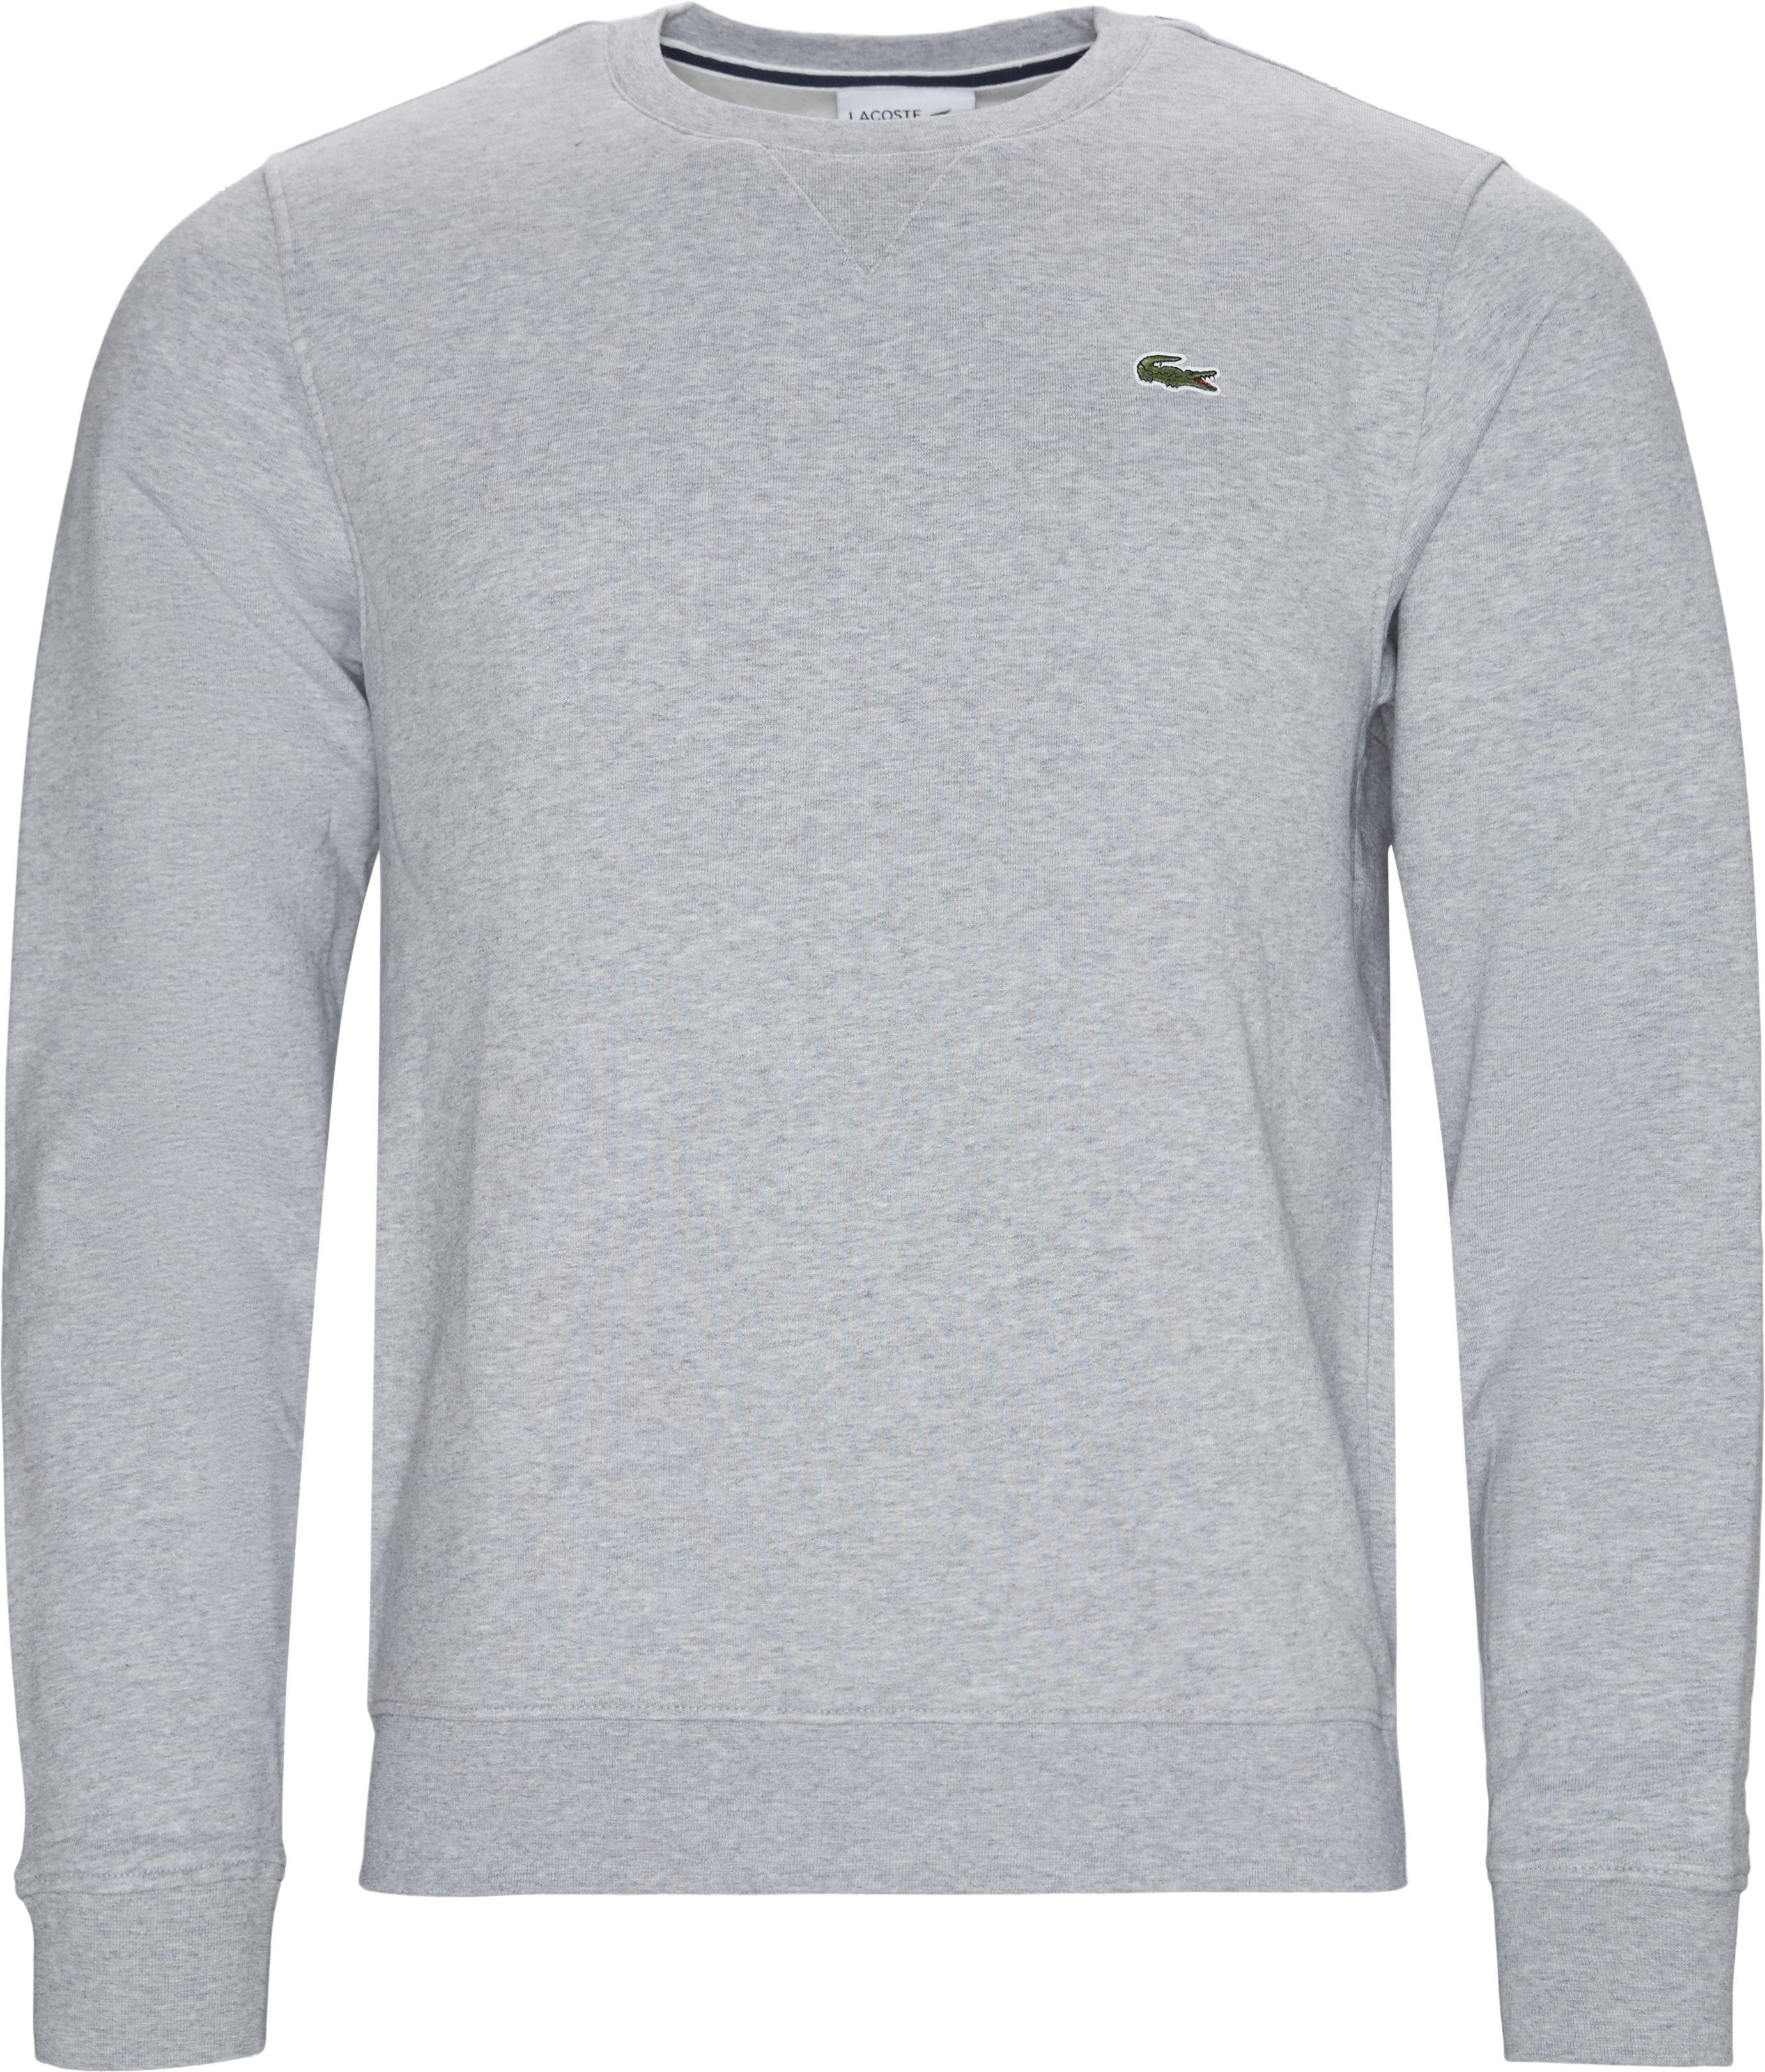 SH7613 Crewneck Sweatshirt - Sweatshirts - Regular - Grå